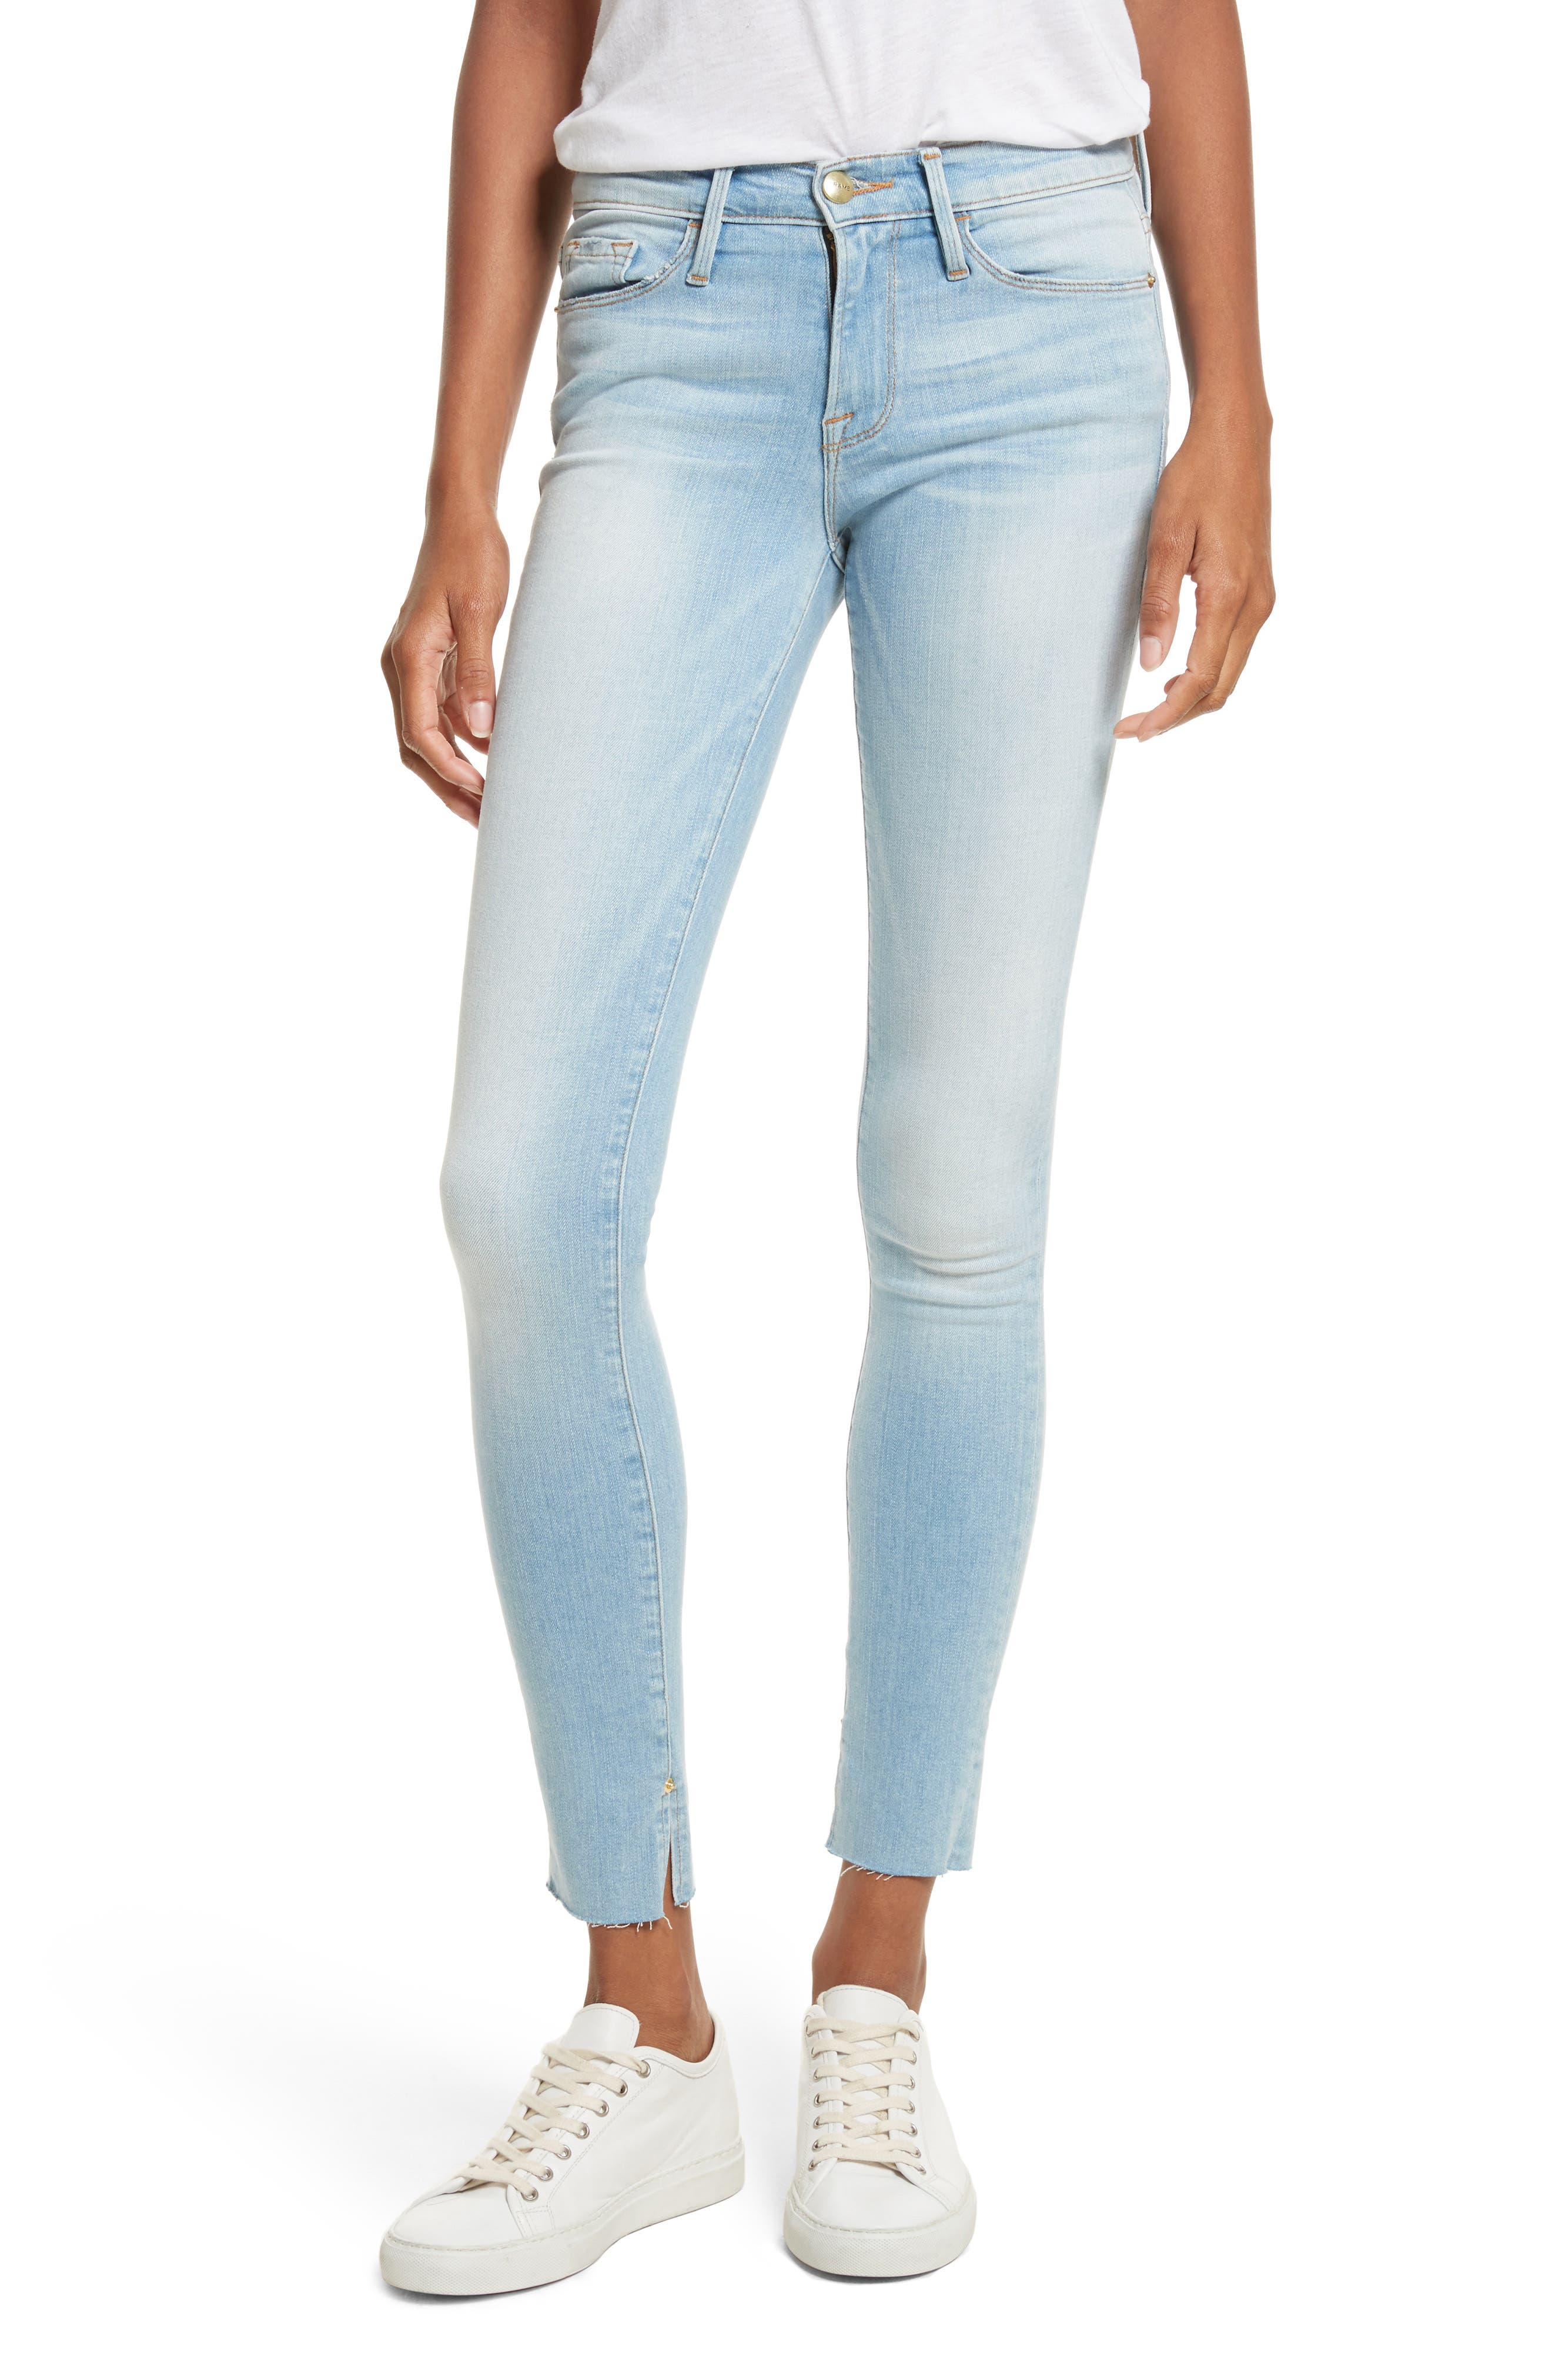 Alternate Image 1 Selected - FRAME Le Skinny de Jeanne Raw Edge Skinny Jeans